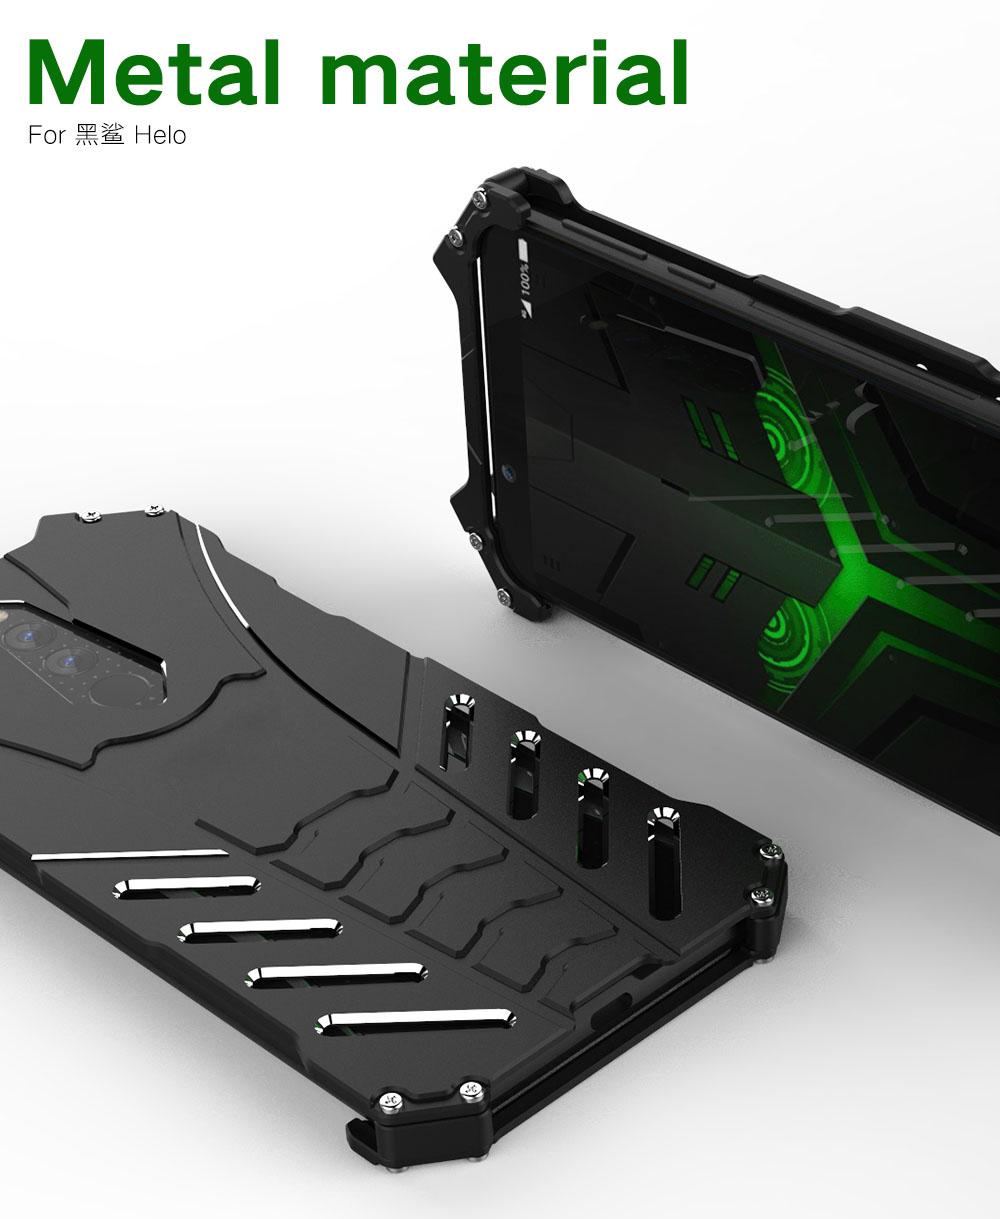 Xiaomi Black Shark 2 case